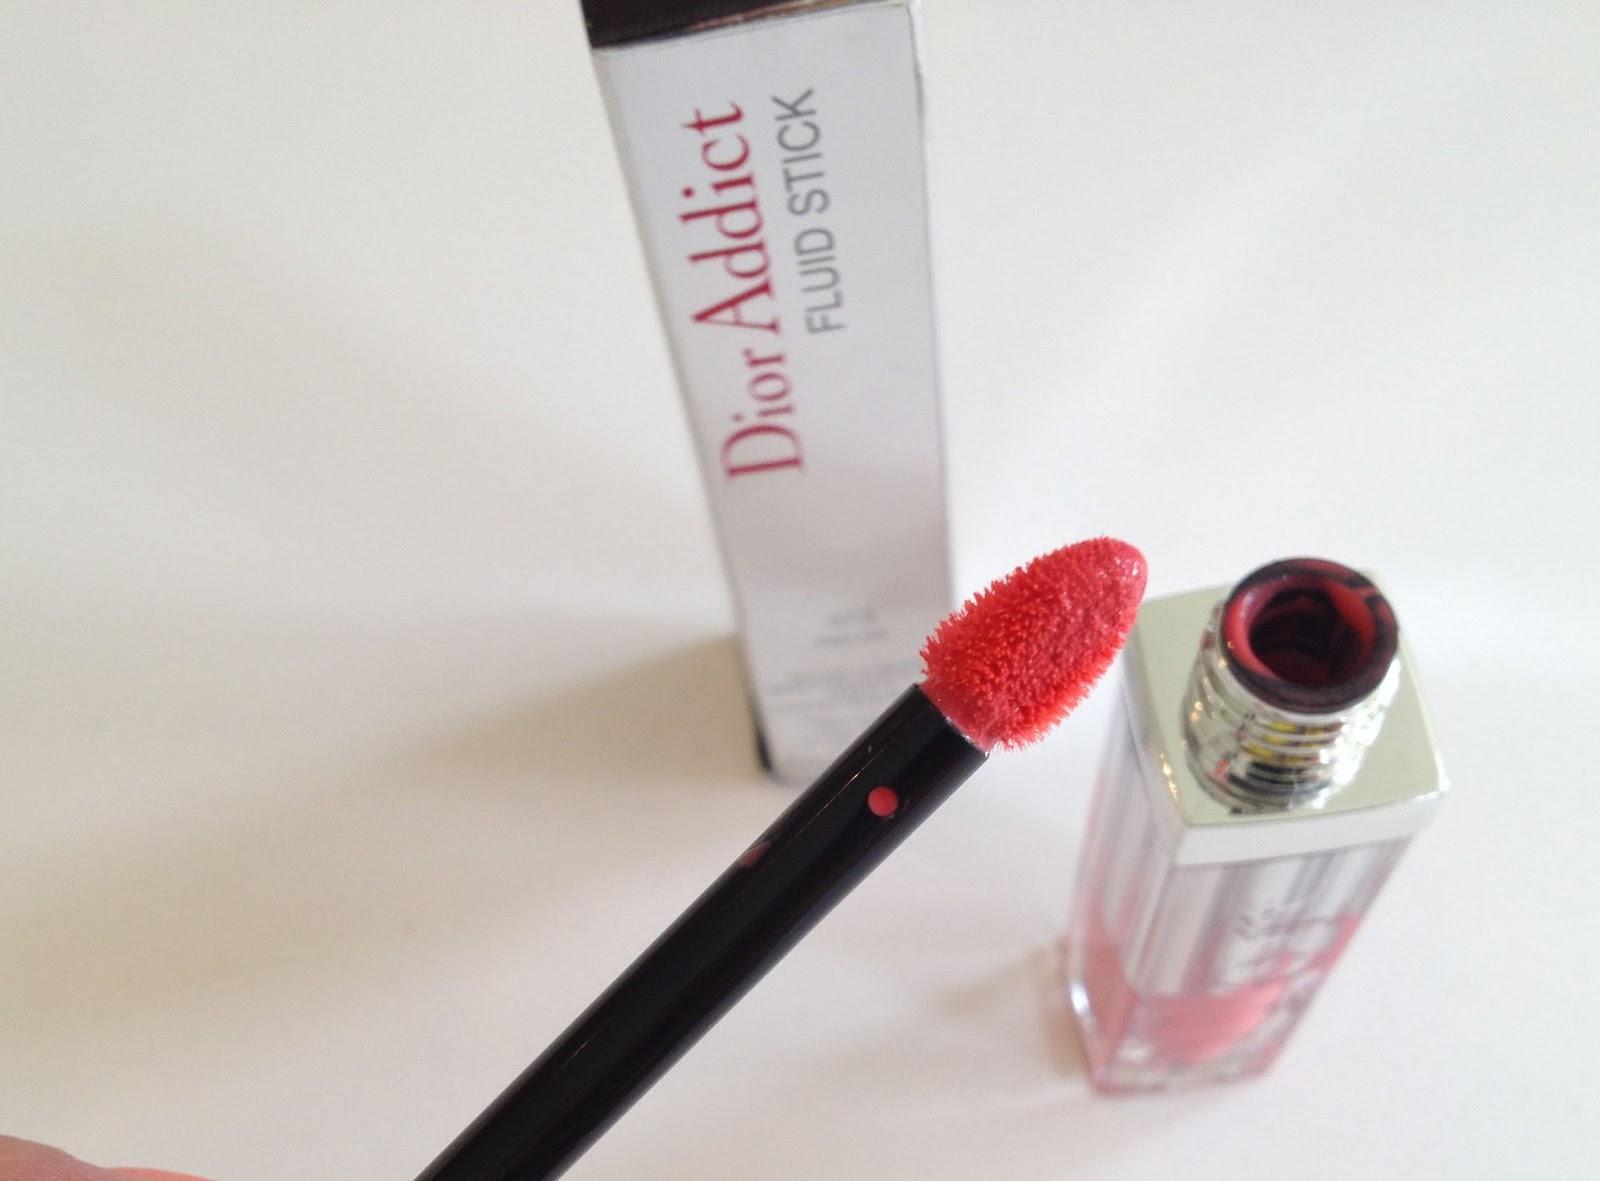 Dior Fluid Stick 373 Rieuse wand